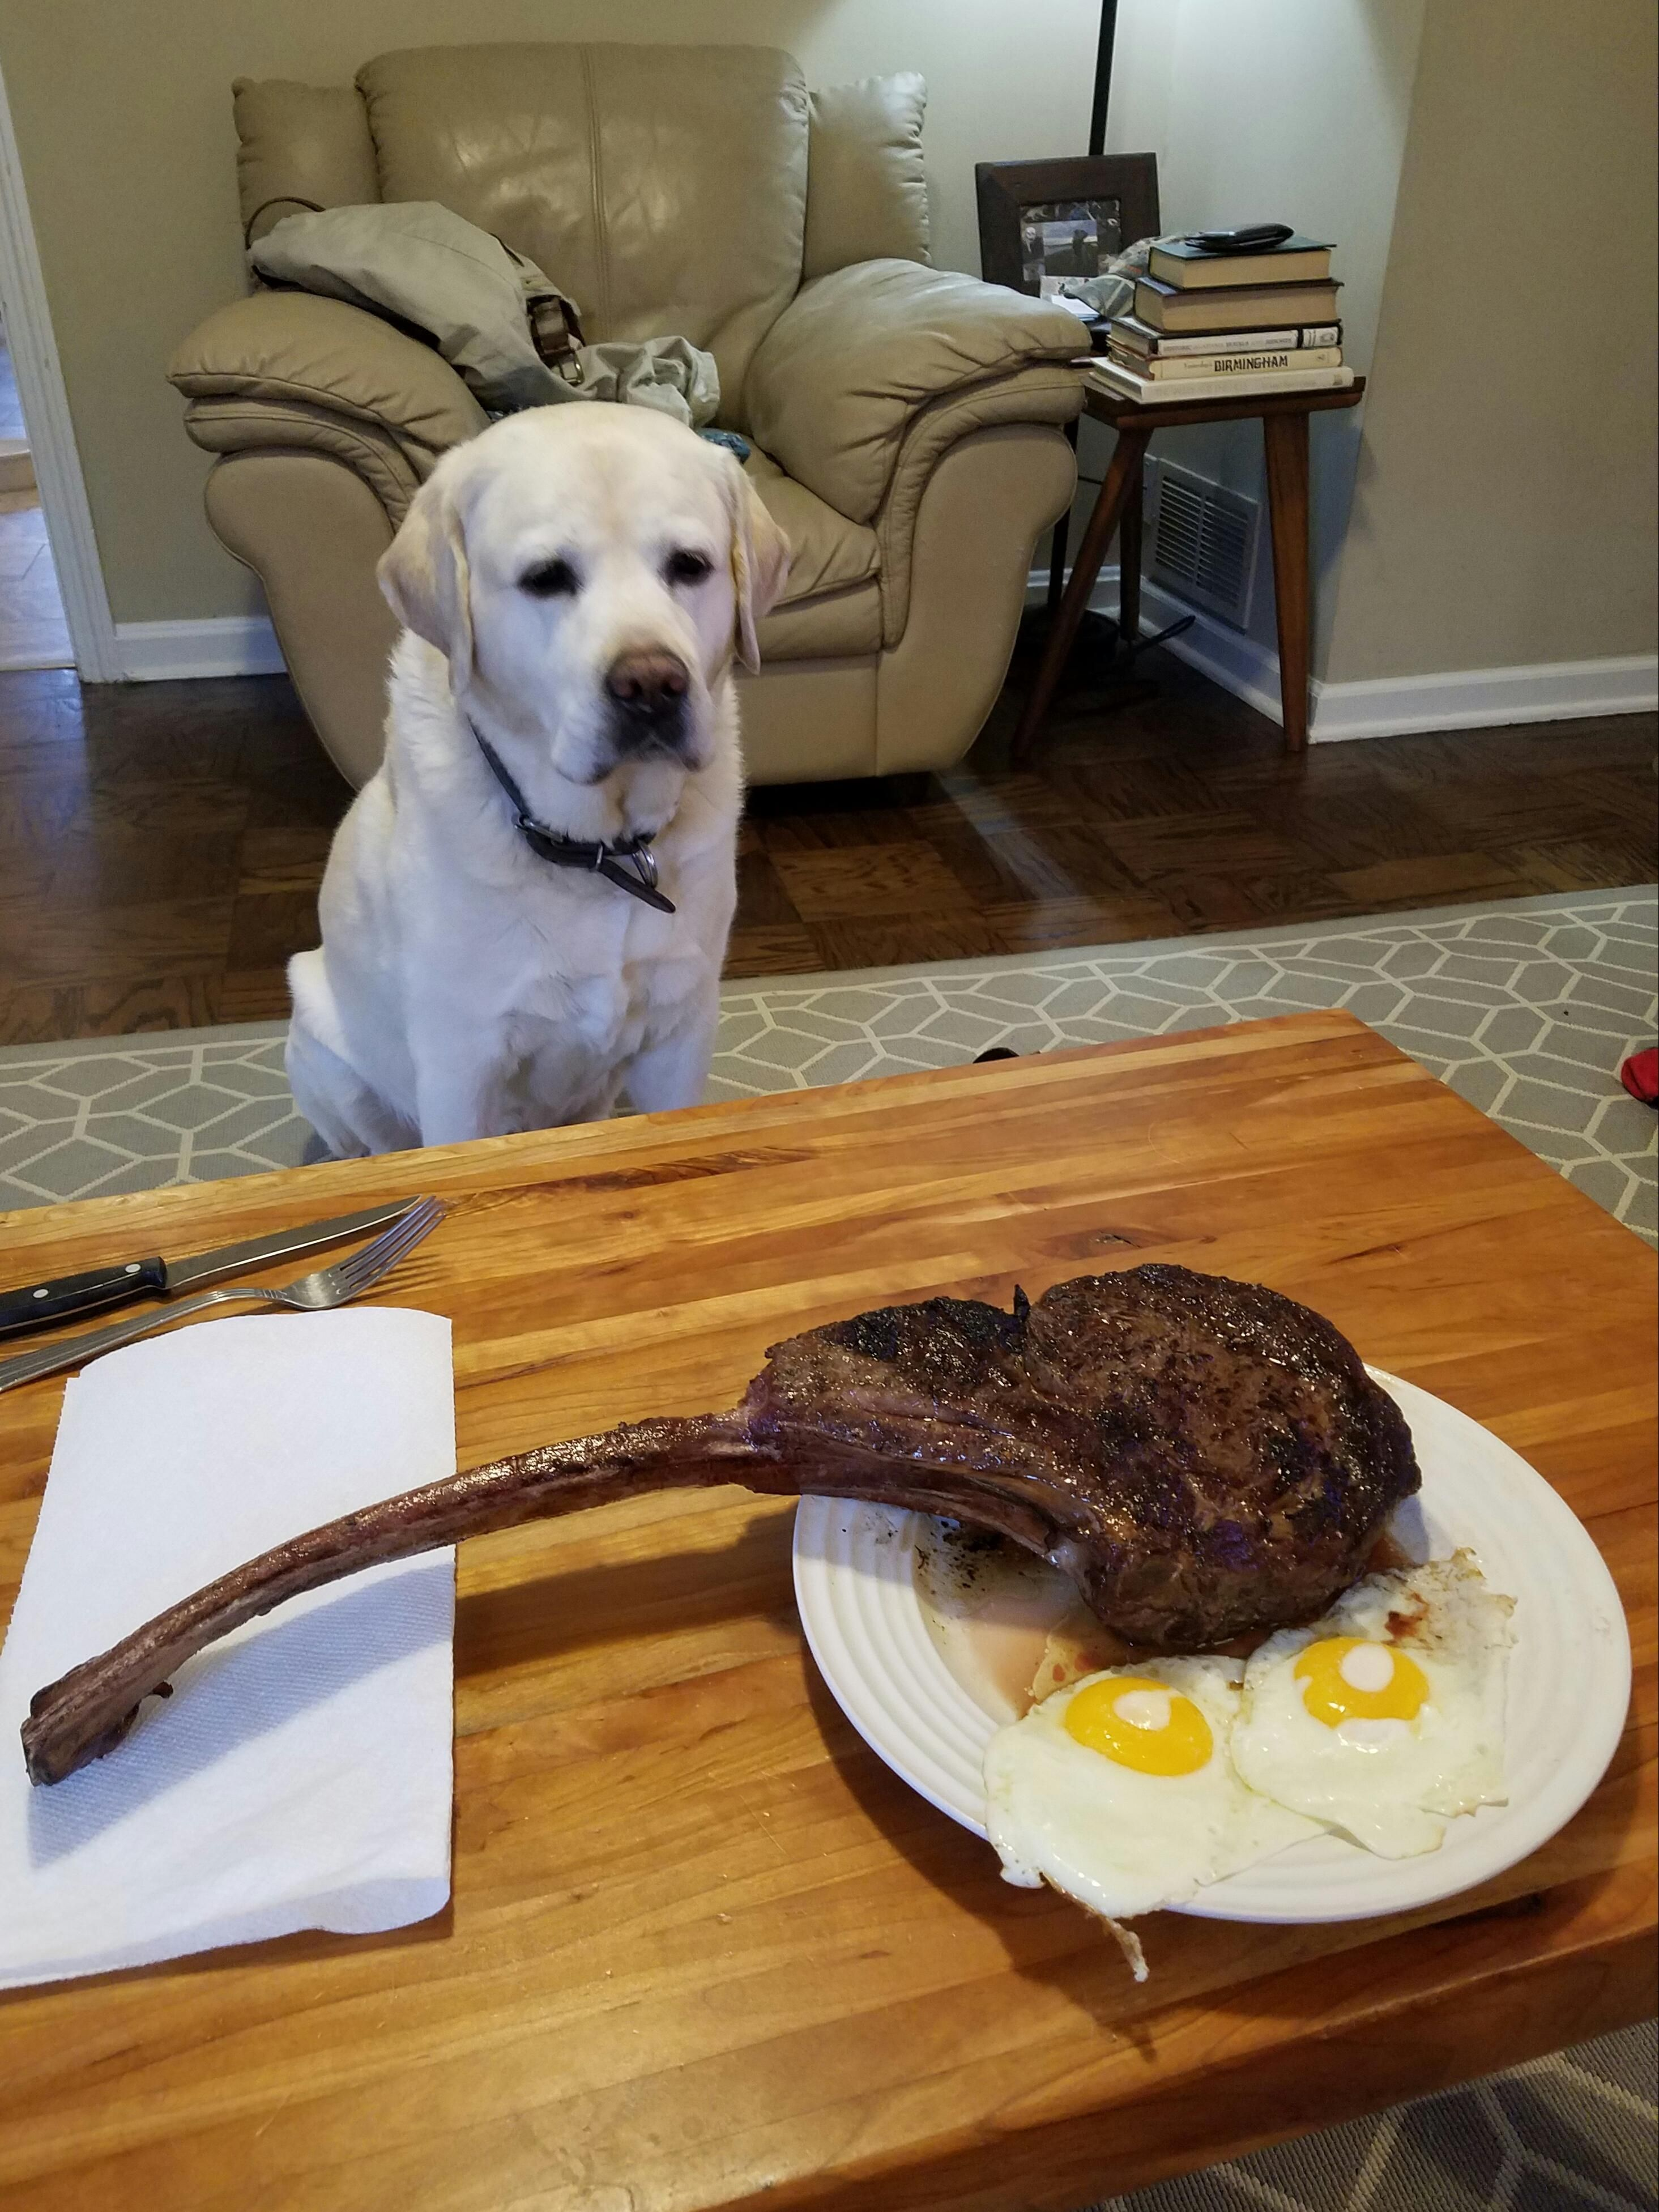 [Homemade] Steak and eggs http//ift.tt/2mUU4t1 Funny